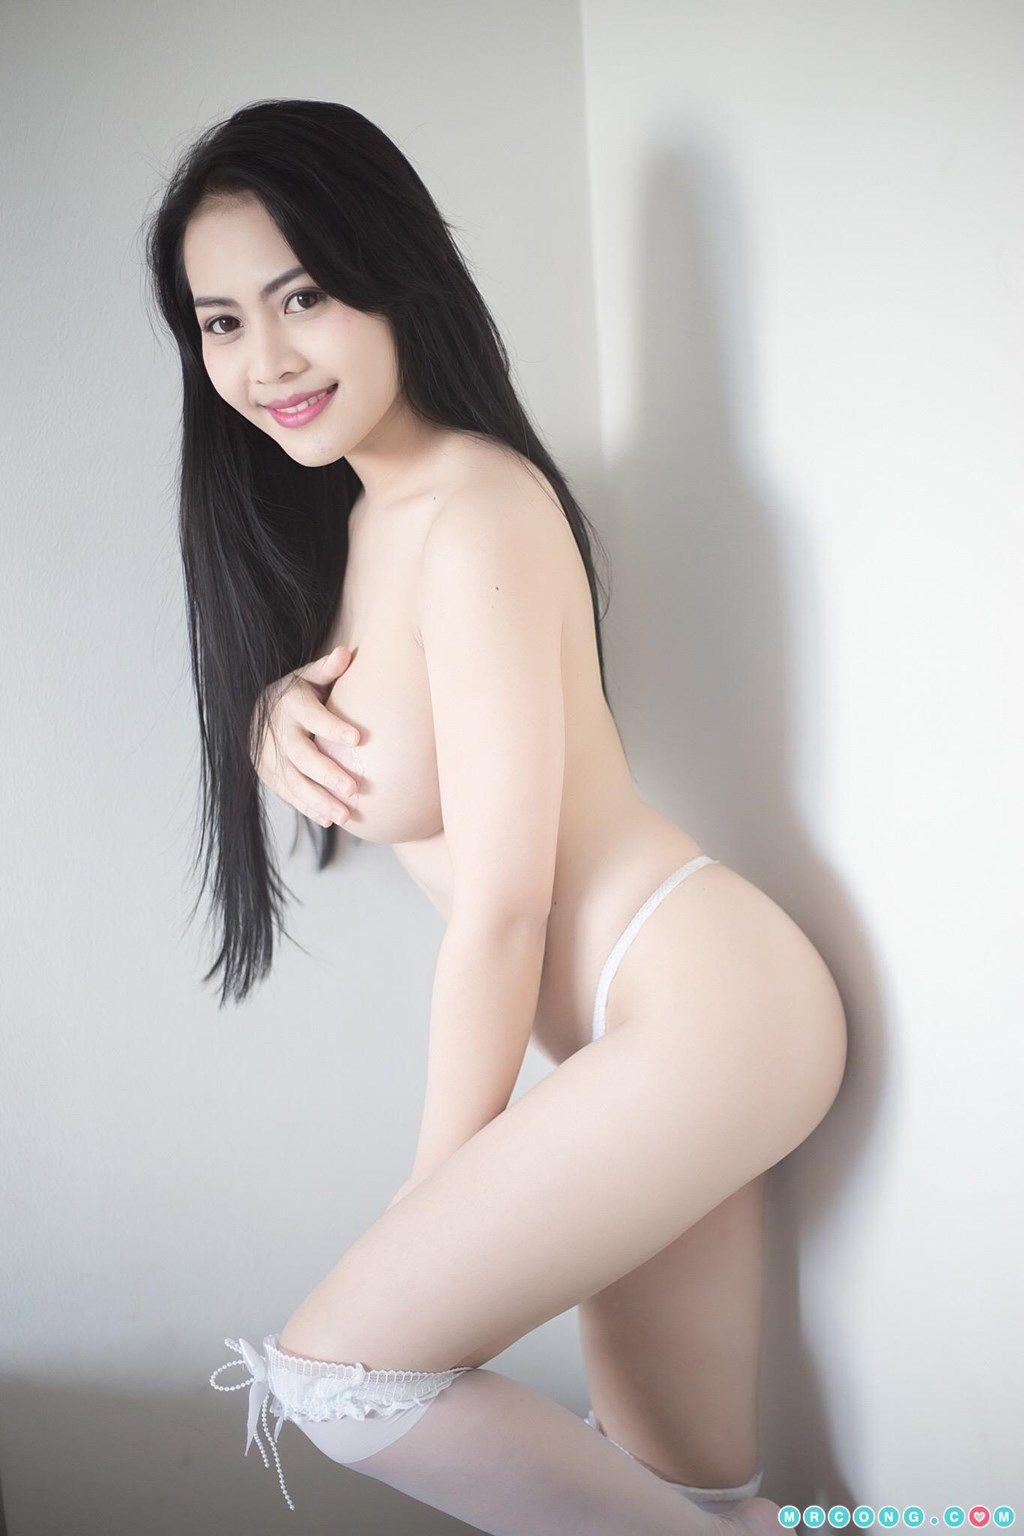 Erotic massage italy nudist chat